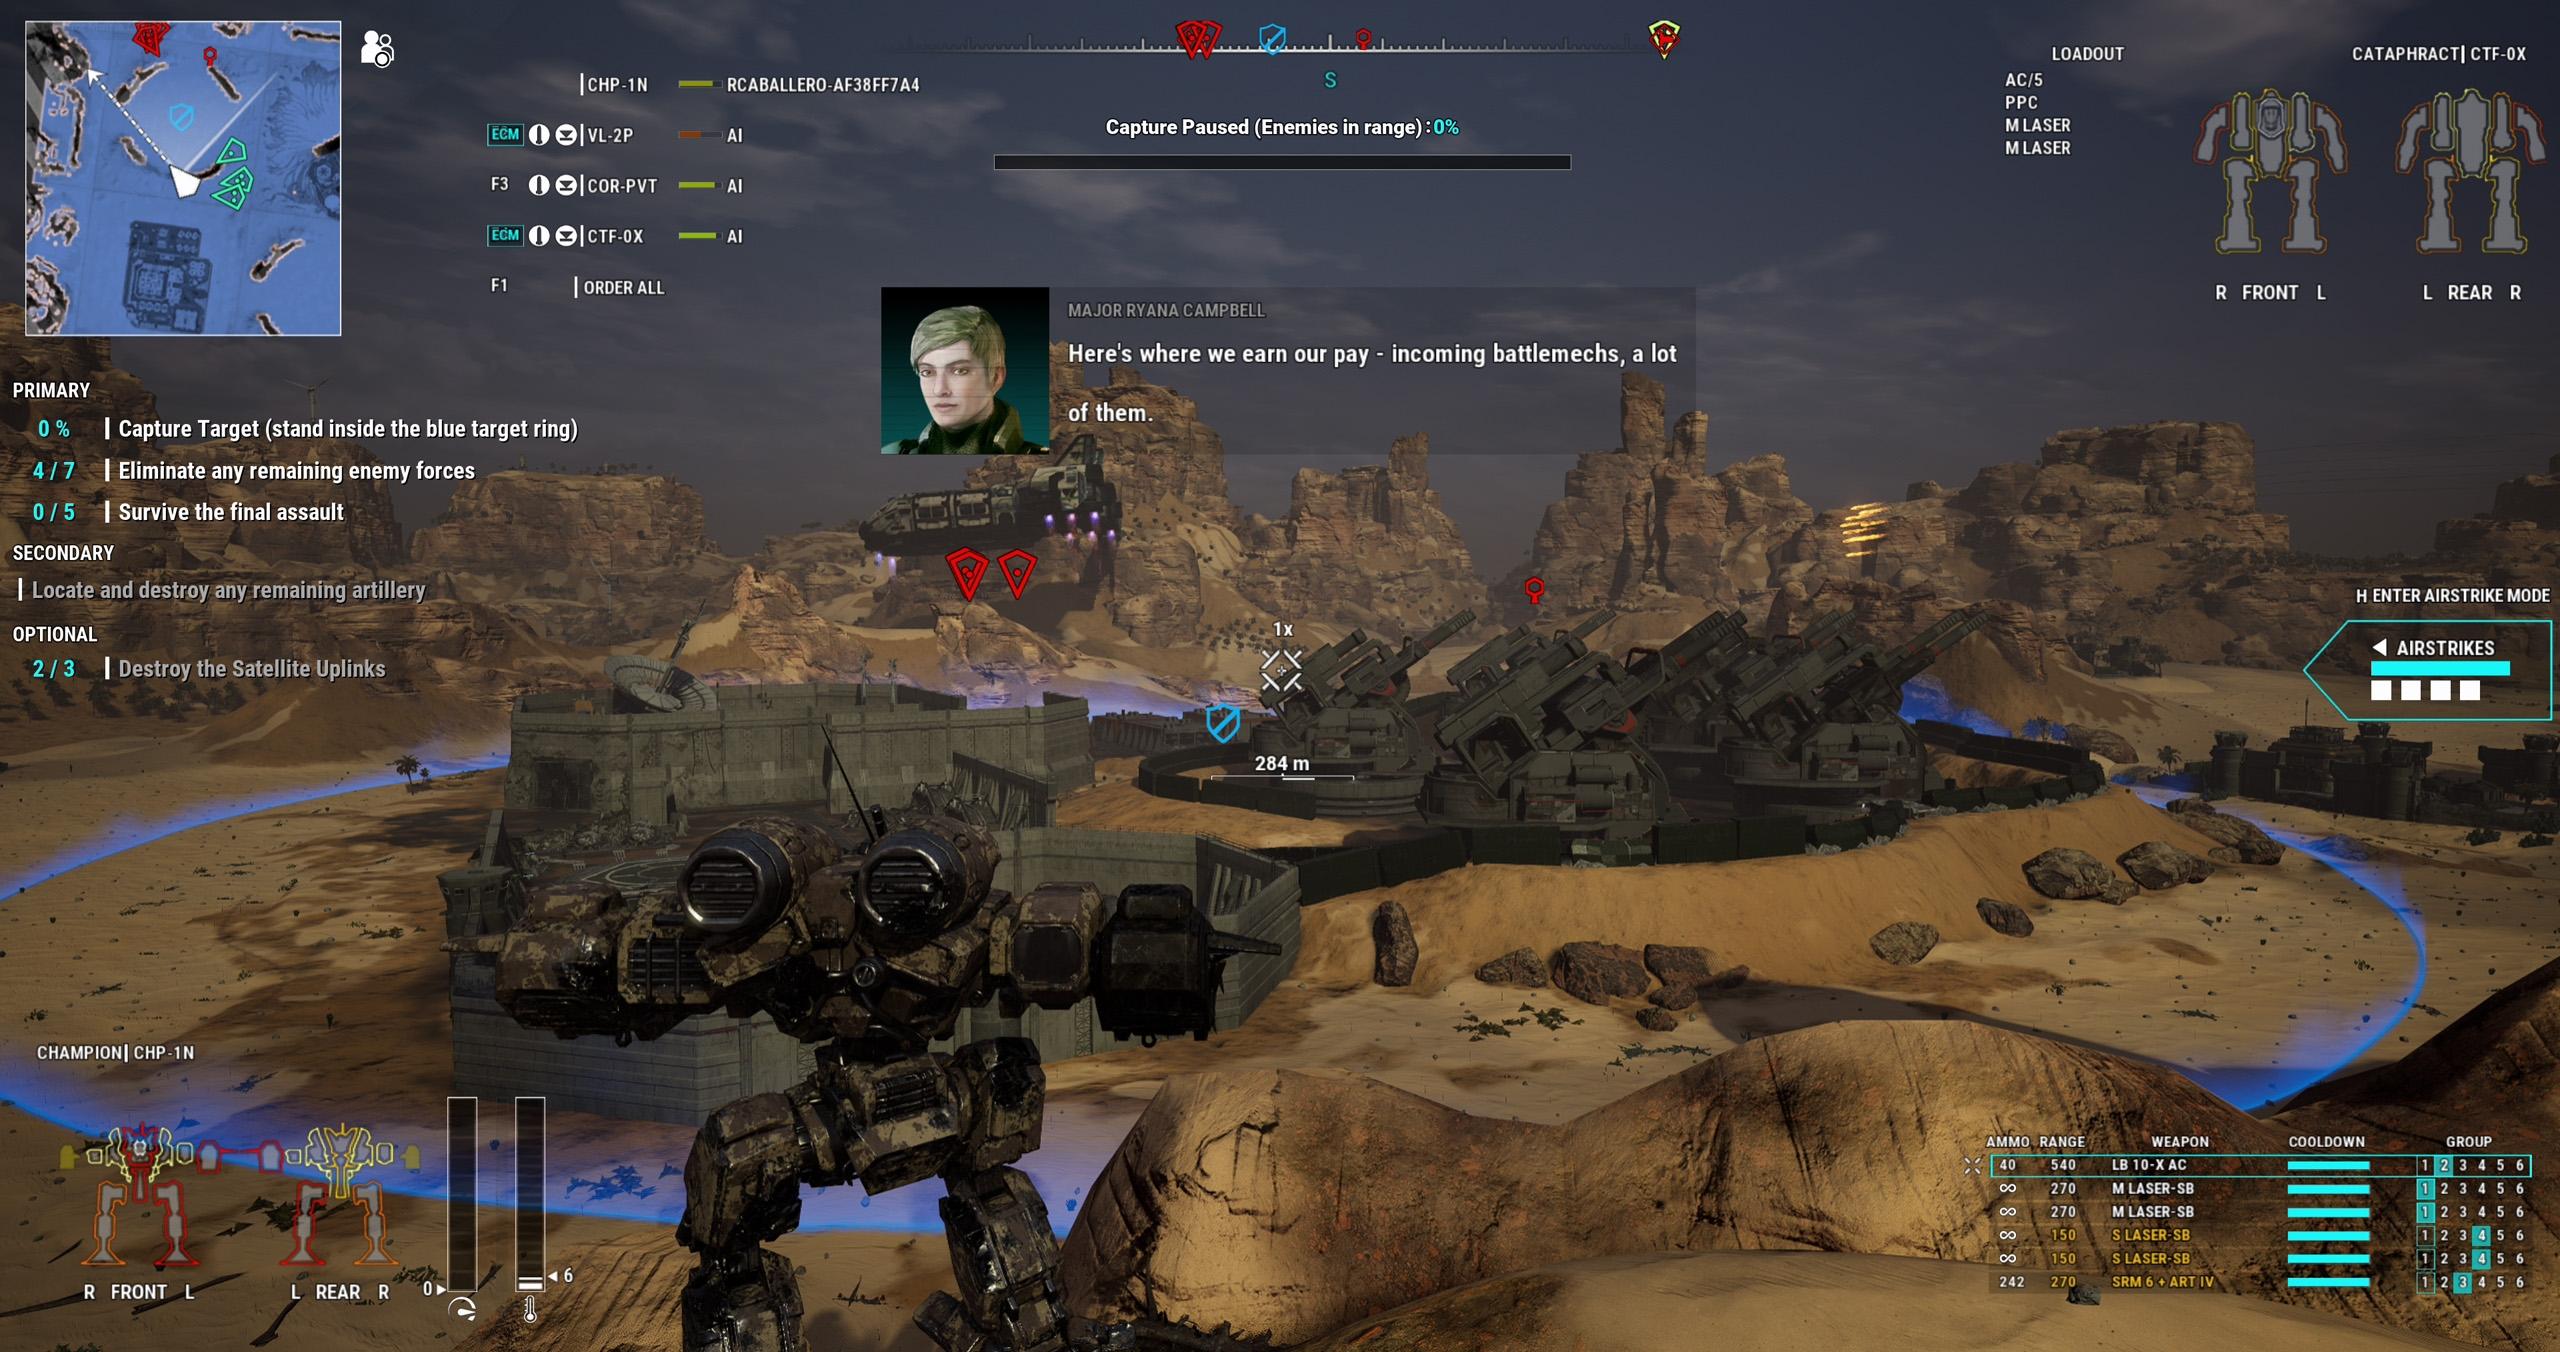 MechWarrior 5: Mercenaries - Heroes of the Inner Sphere   ROW (368a3321-7fc3-4552-b51f-86f58e1d5d66)